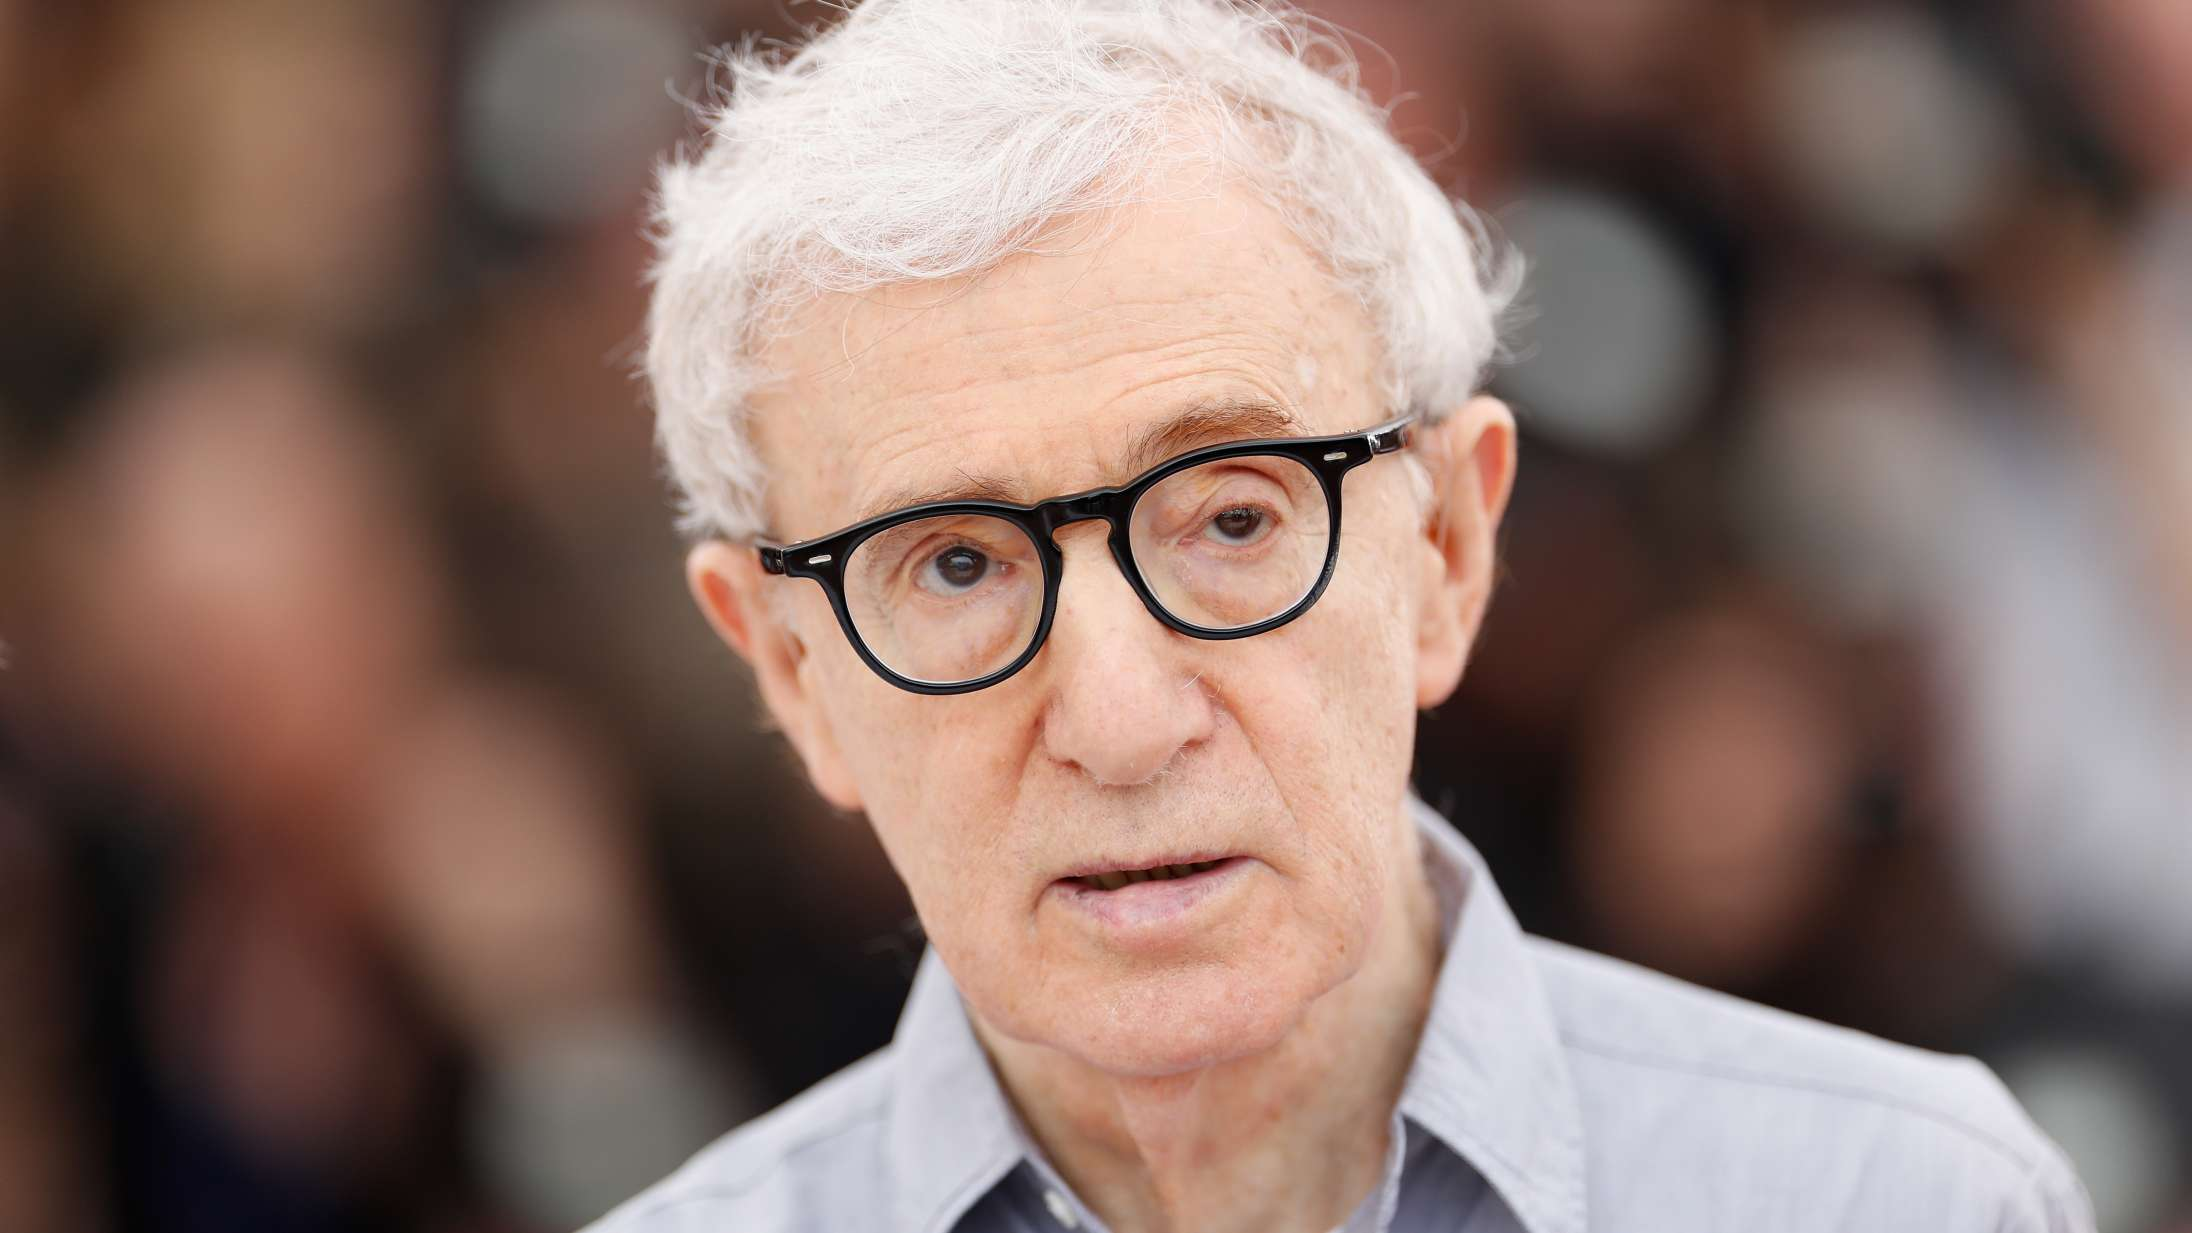 Woody Allen samler skuespillerhold med Christoph Waltz i spidsen til sin næste film